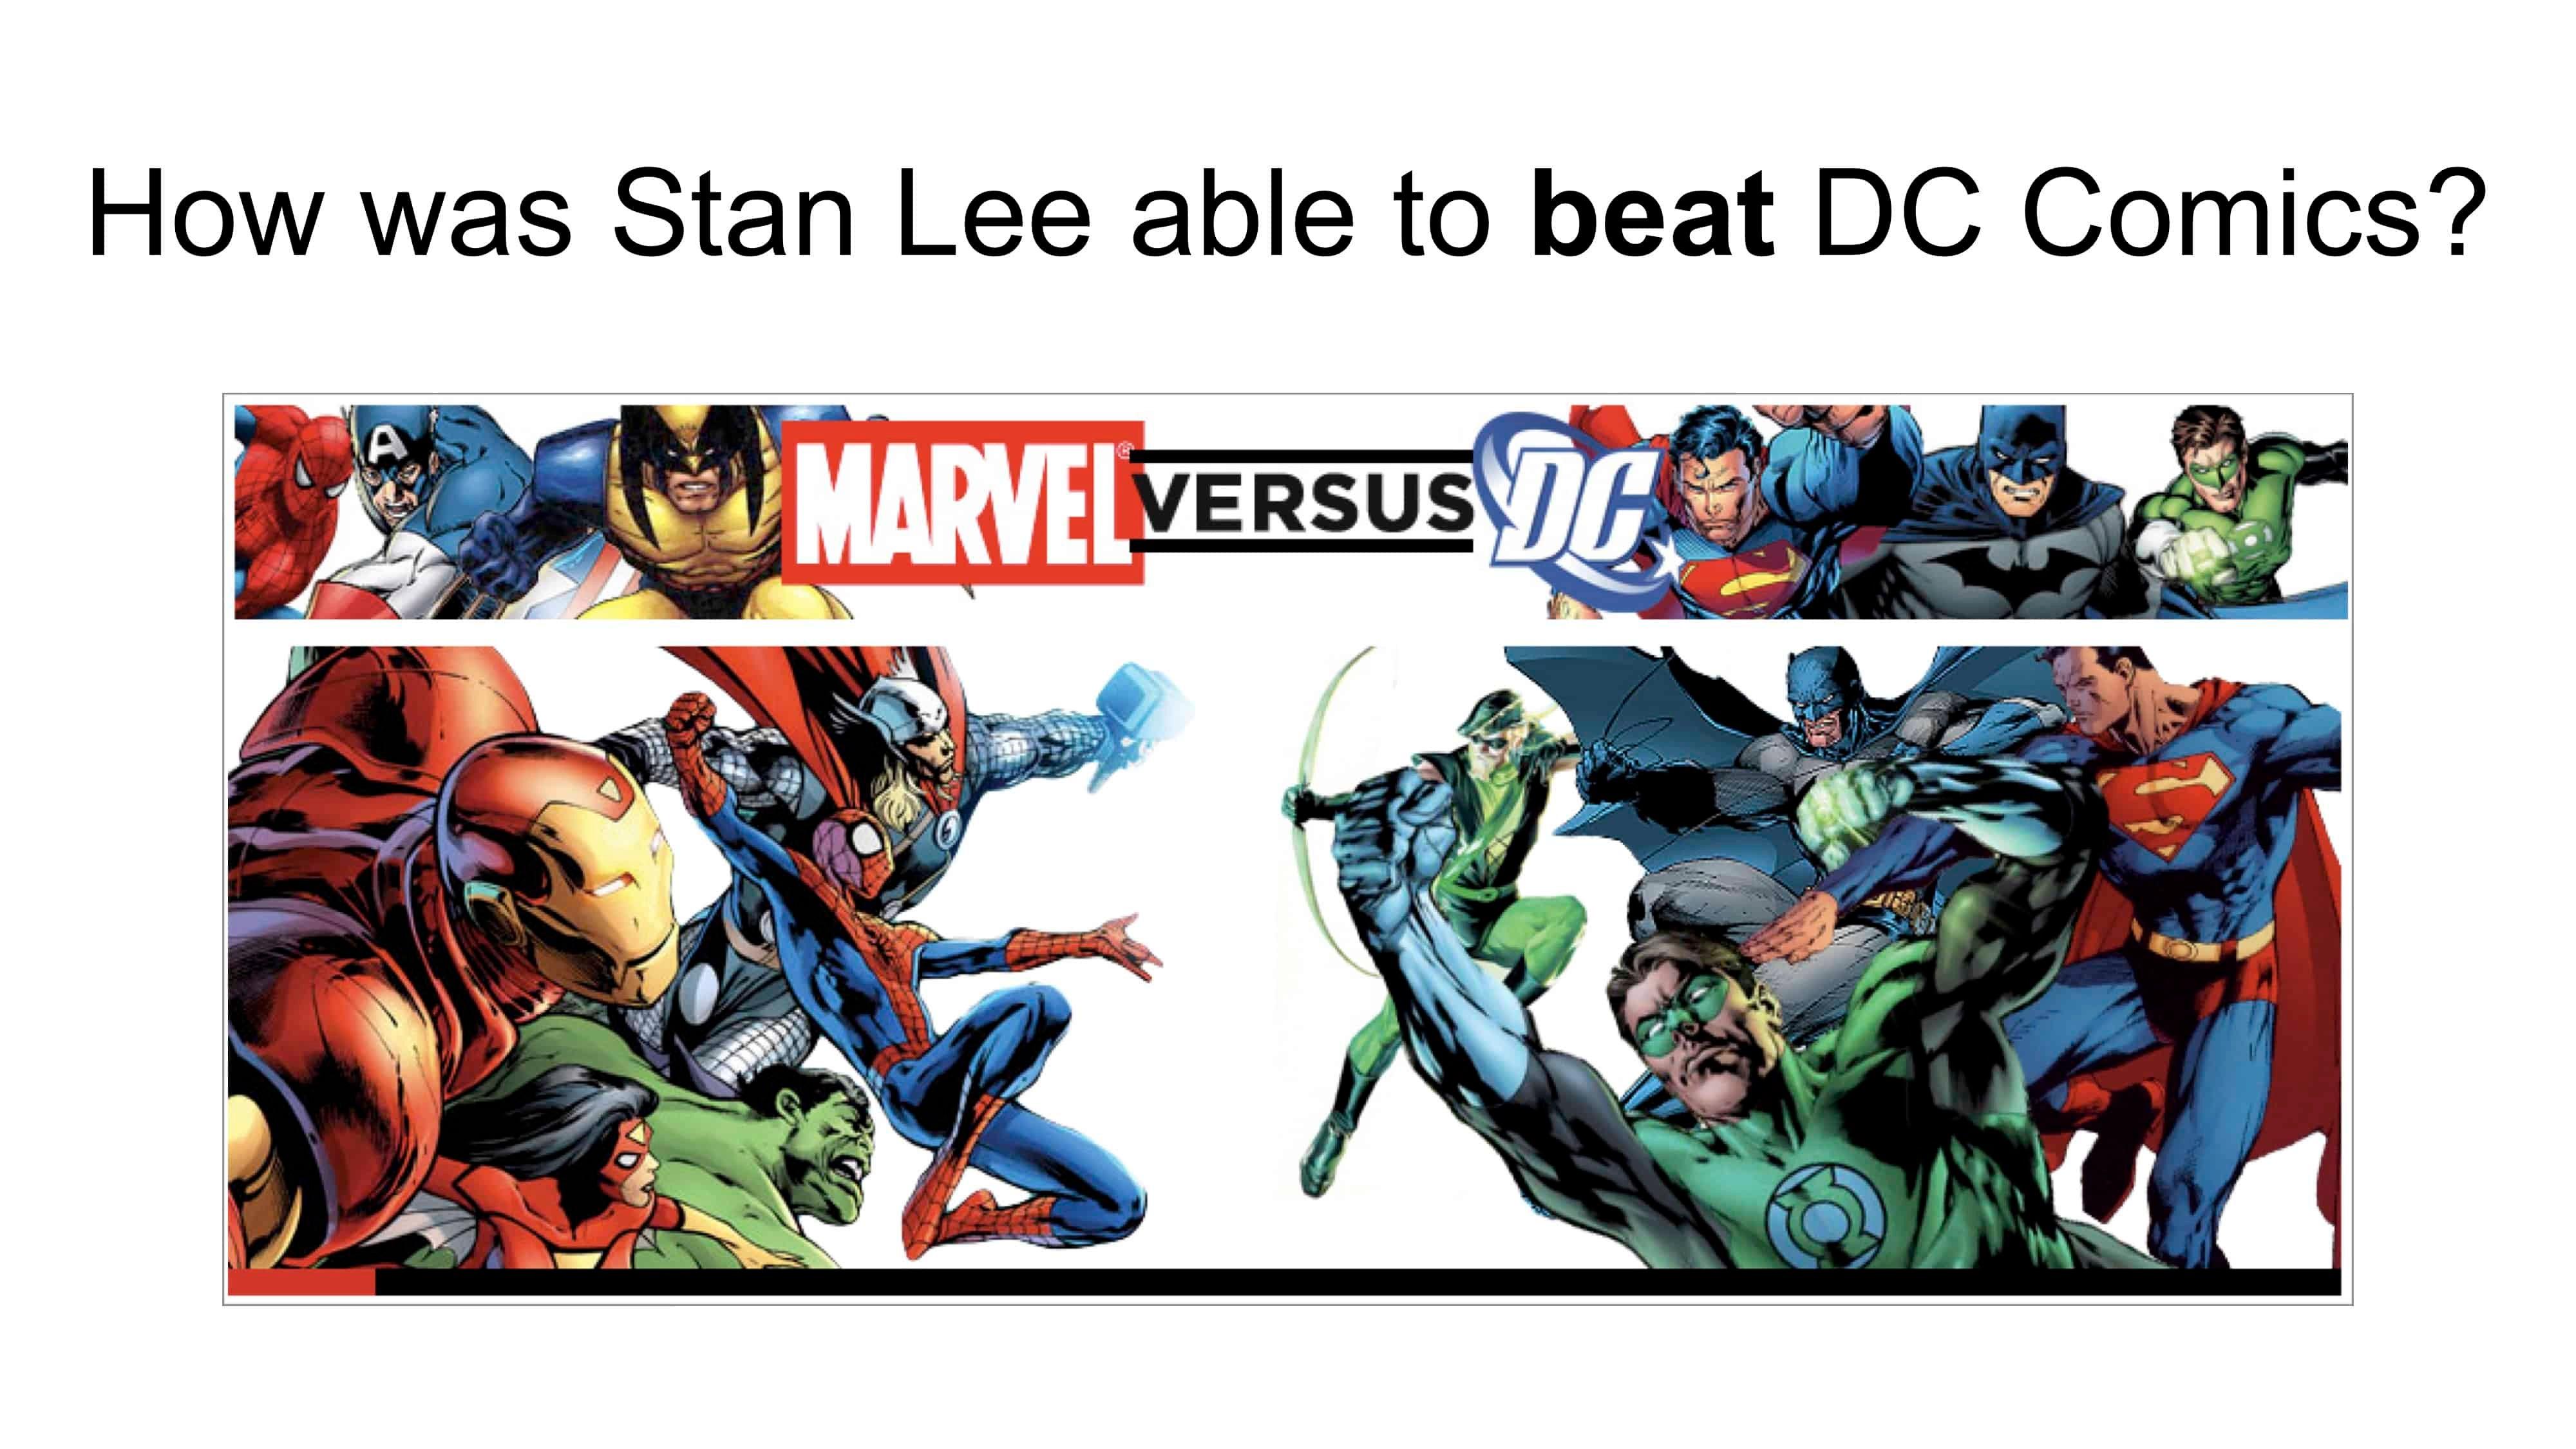 Stan Lee beat DC Comics